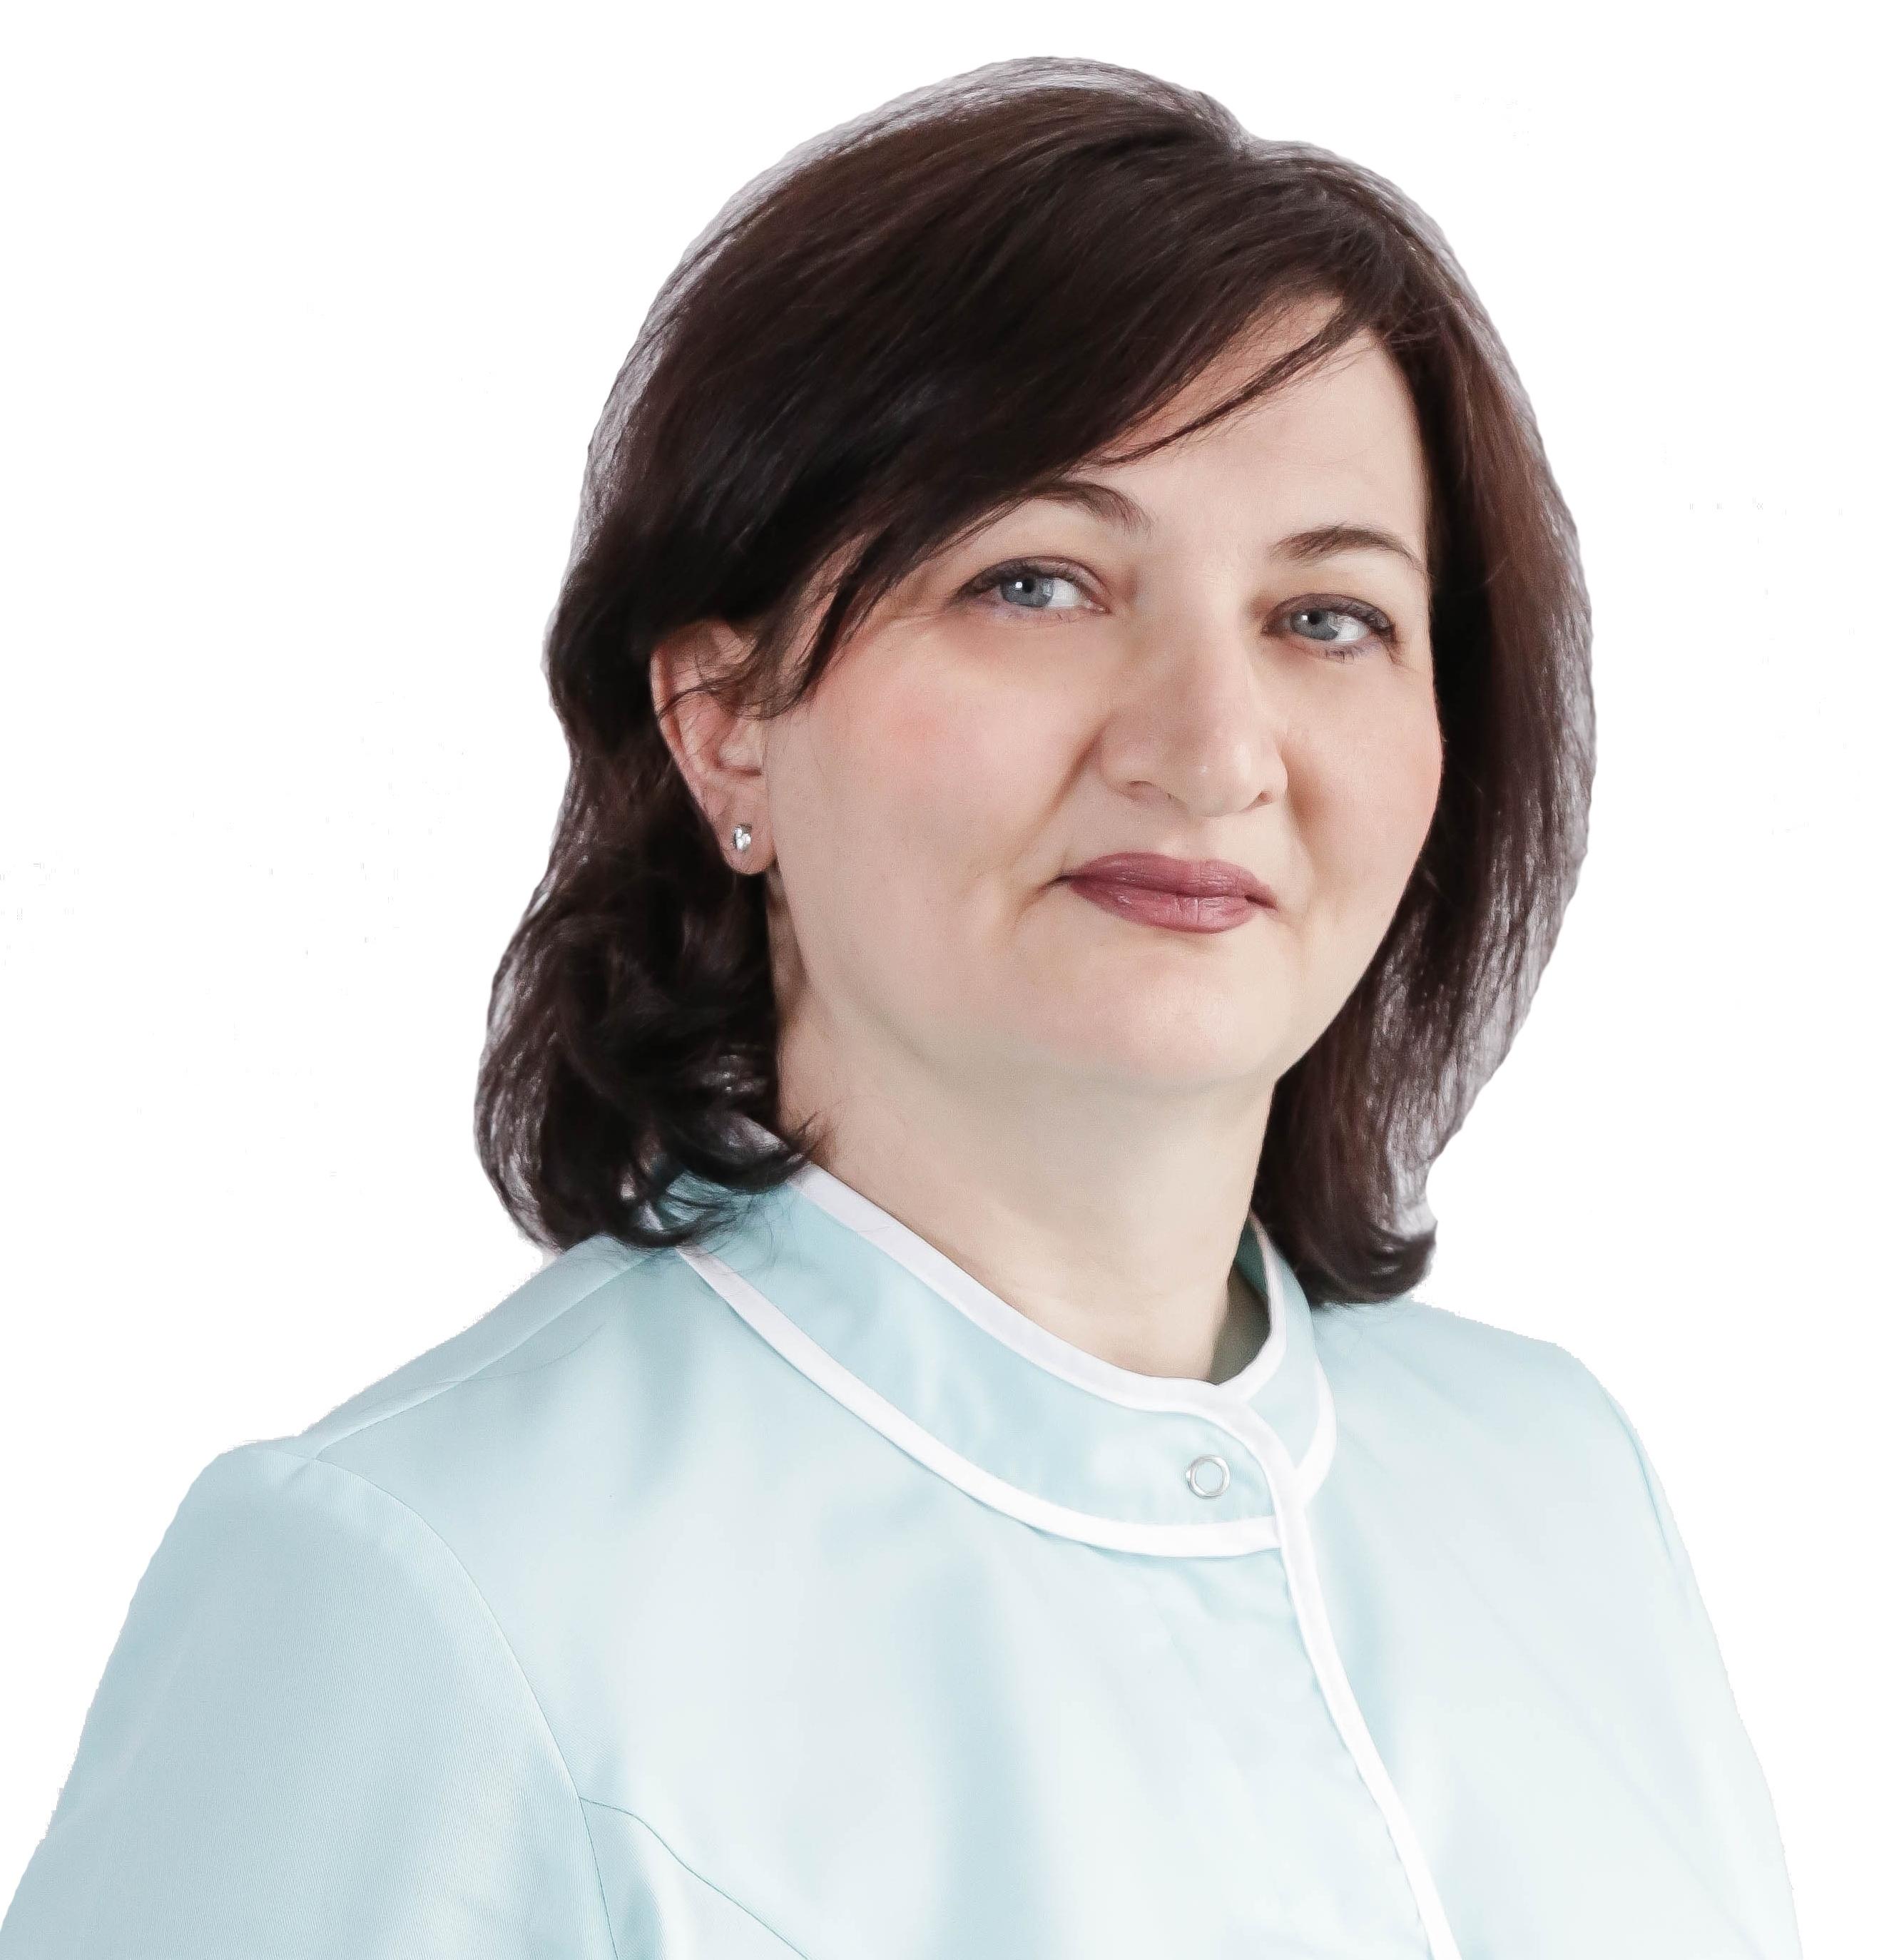 Сафронова Ольга Владимировна